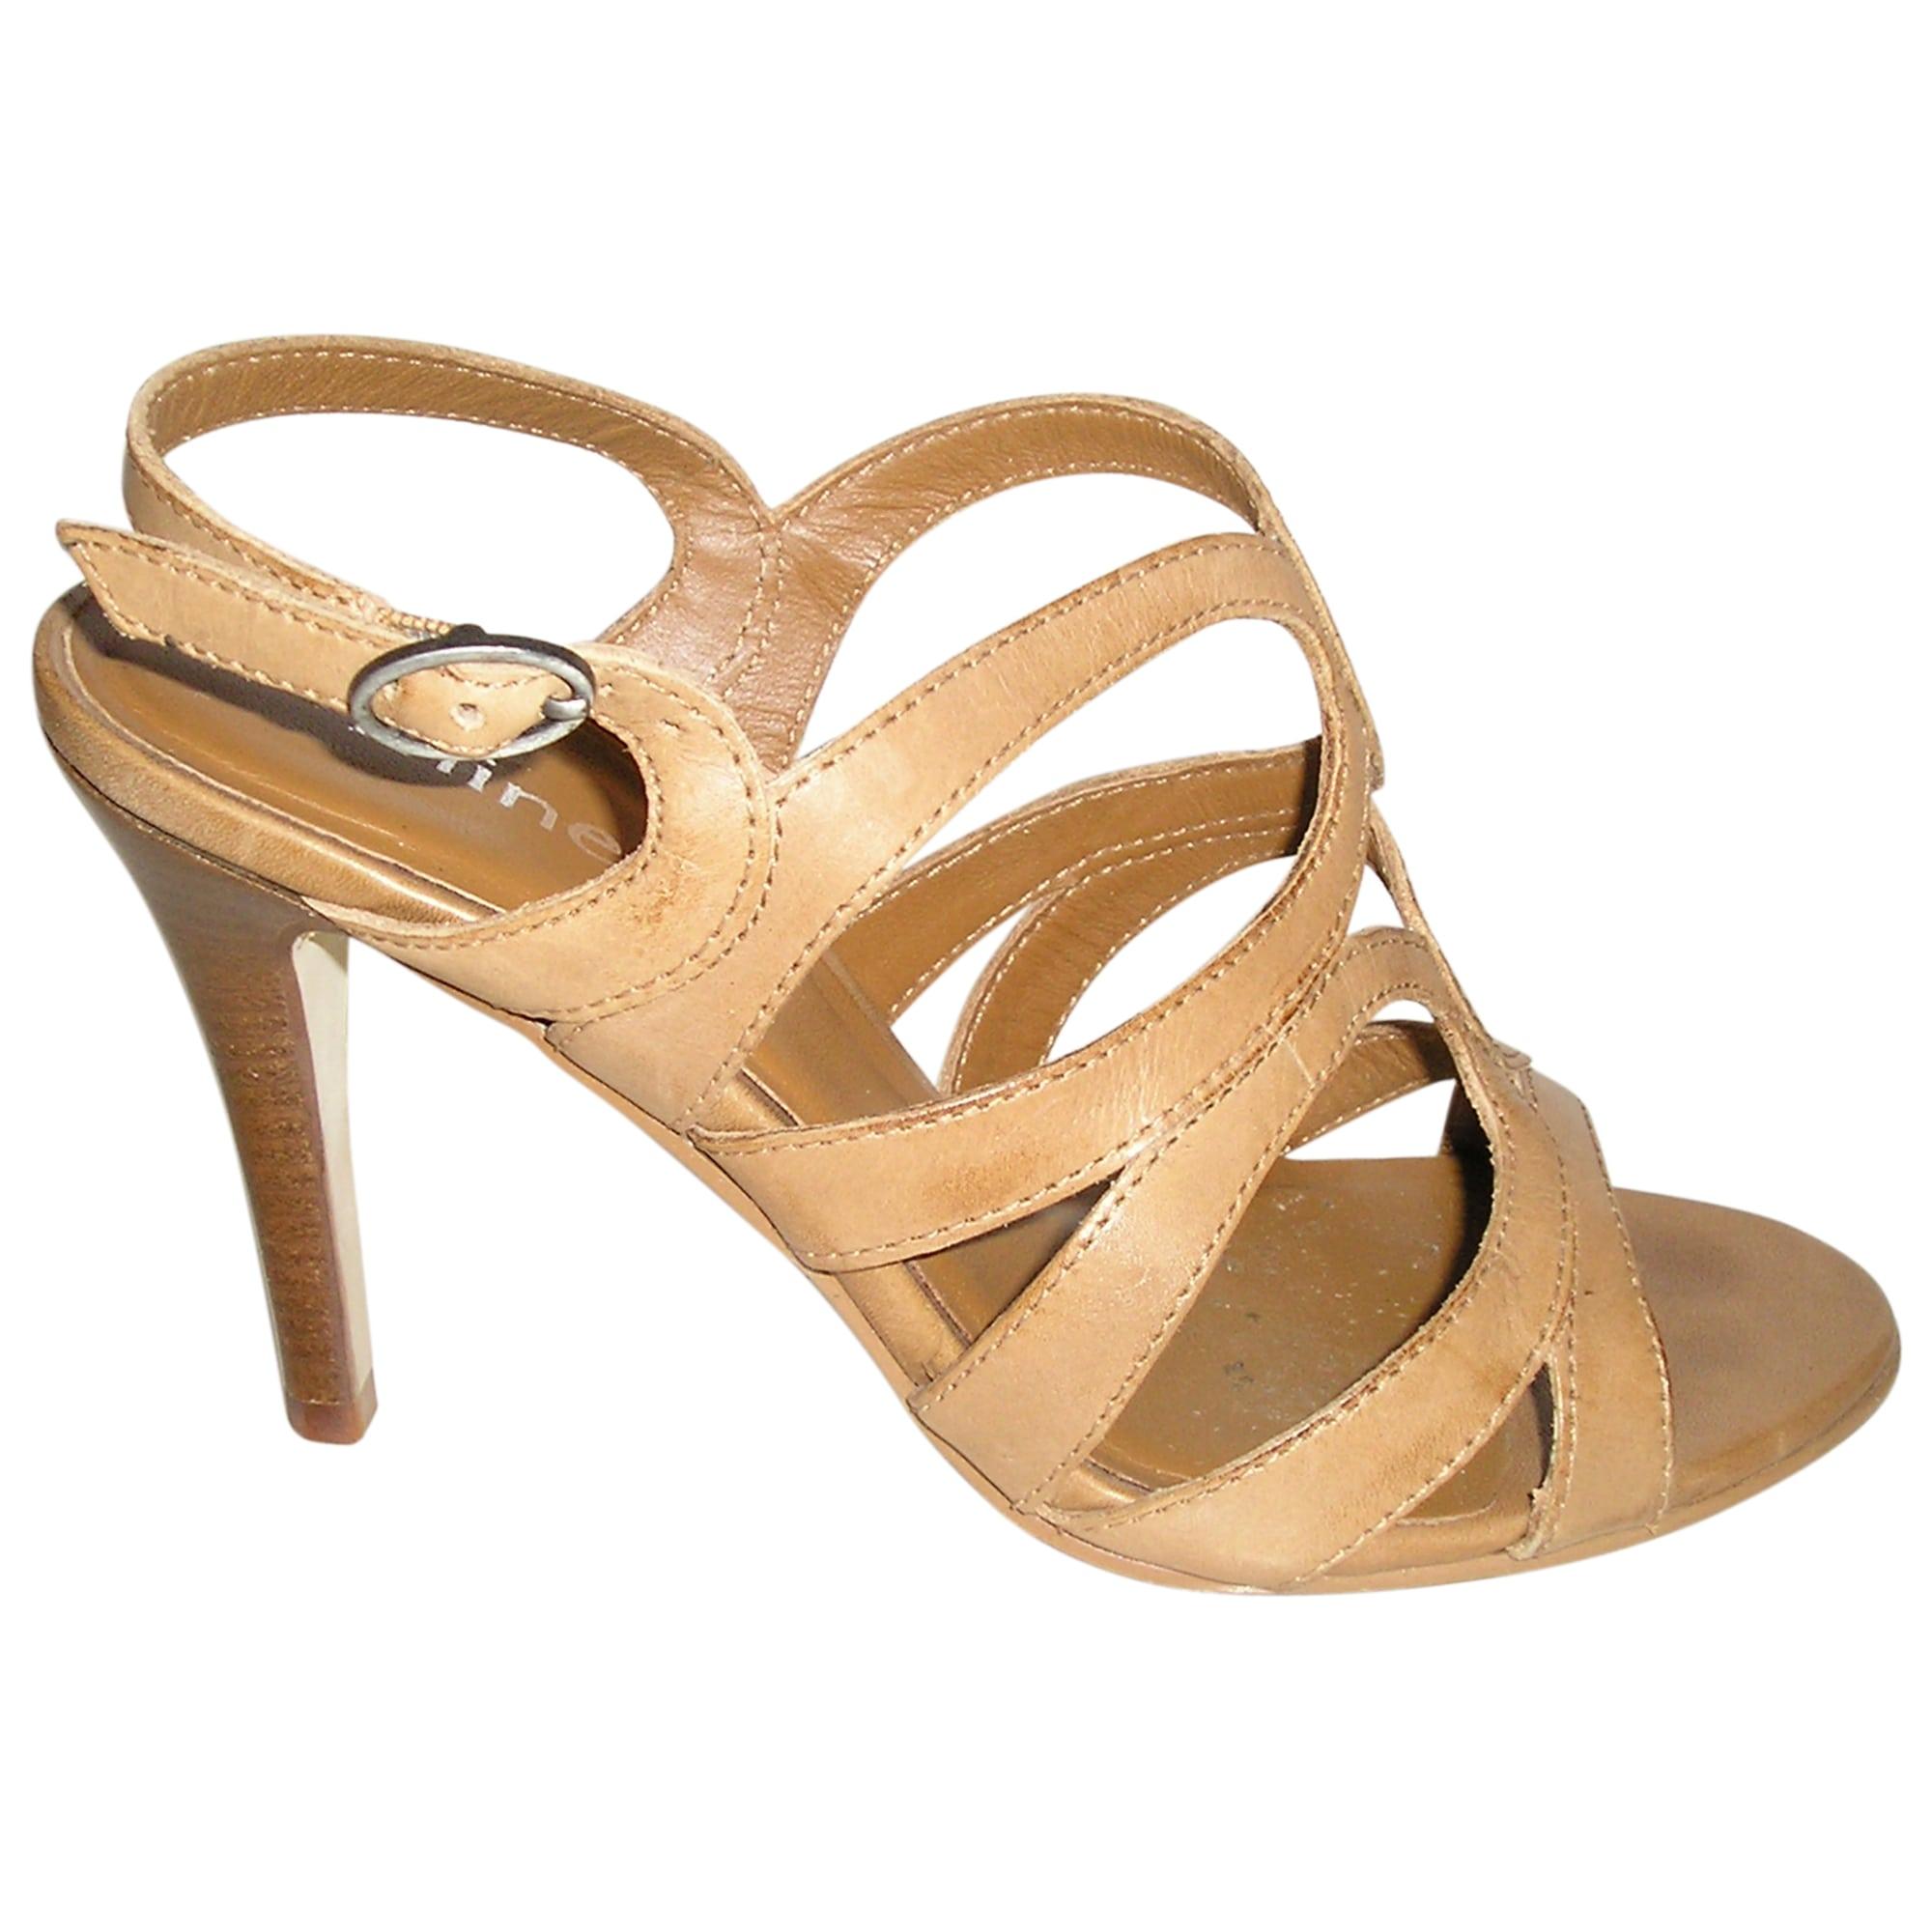 Sandales à talons MINELLI Beige, camel